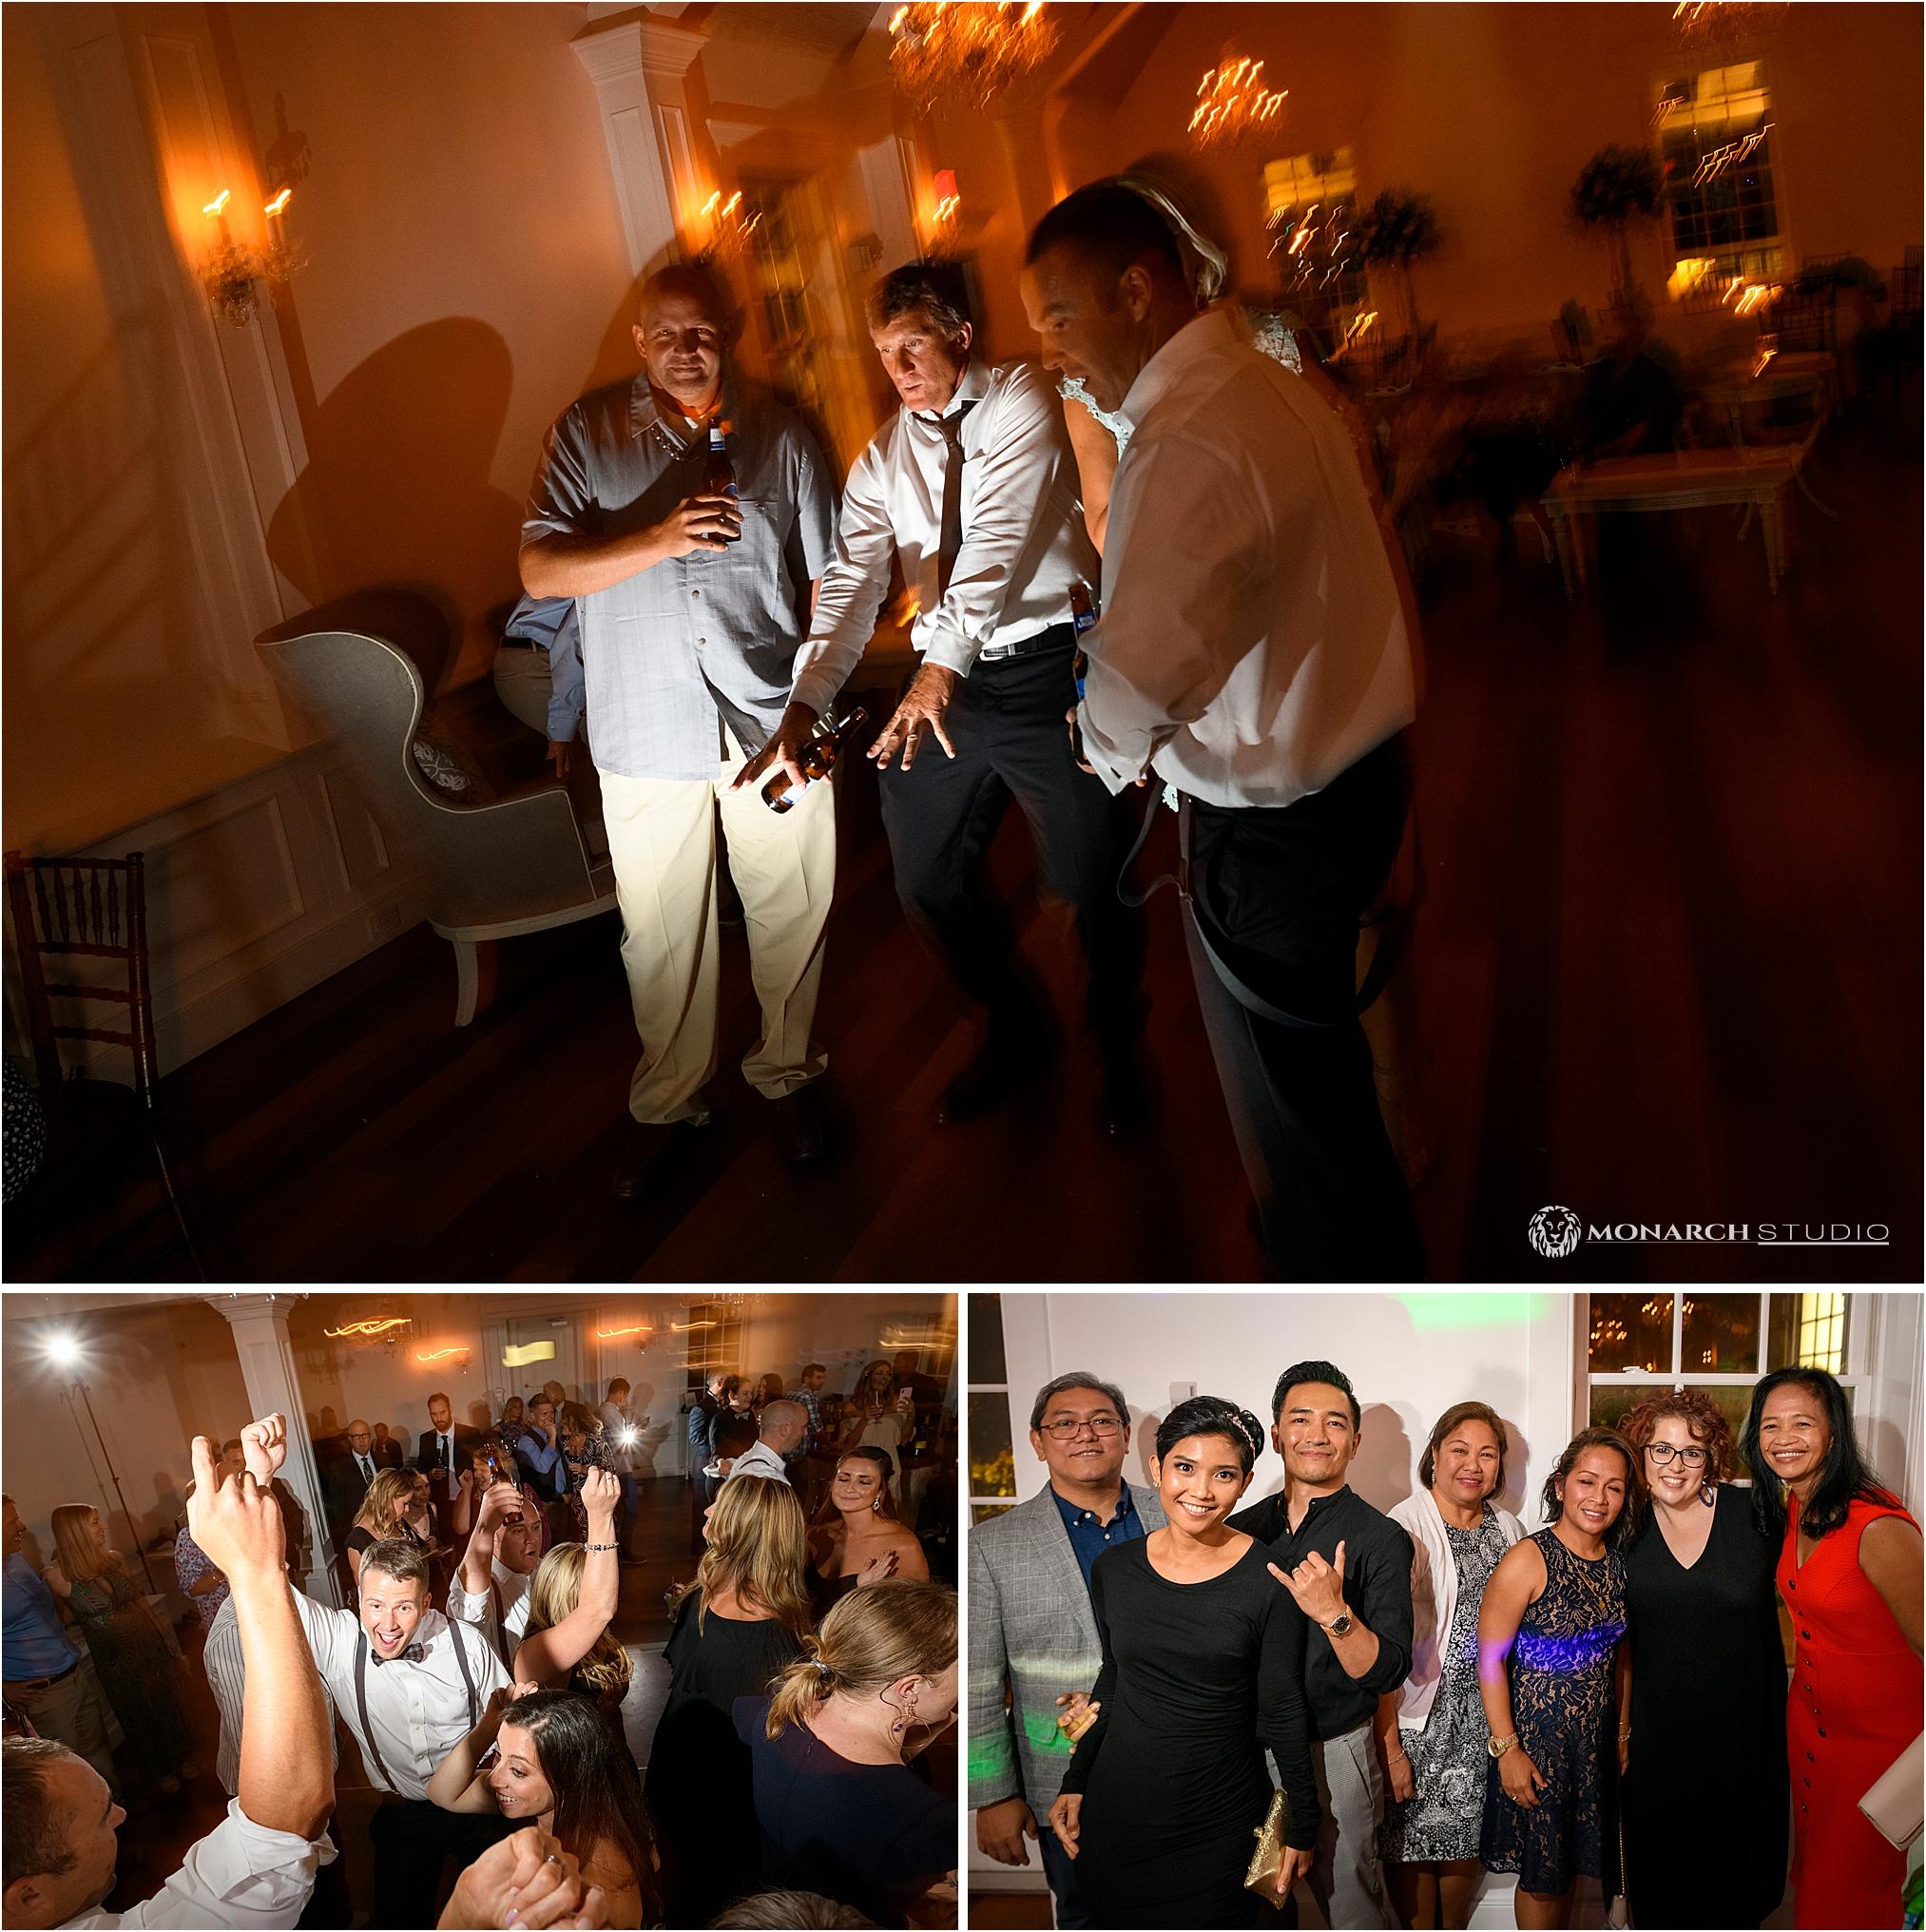 116-whiteroom-wedding-photographer-2019-05-22_0098.jpg